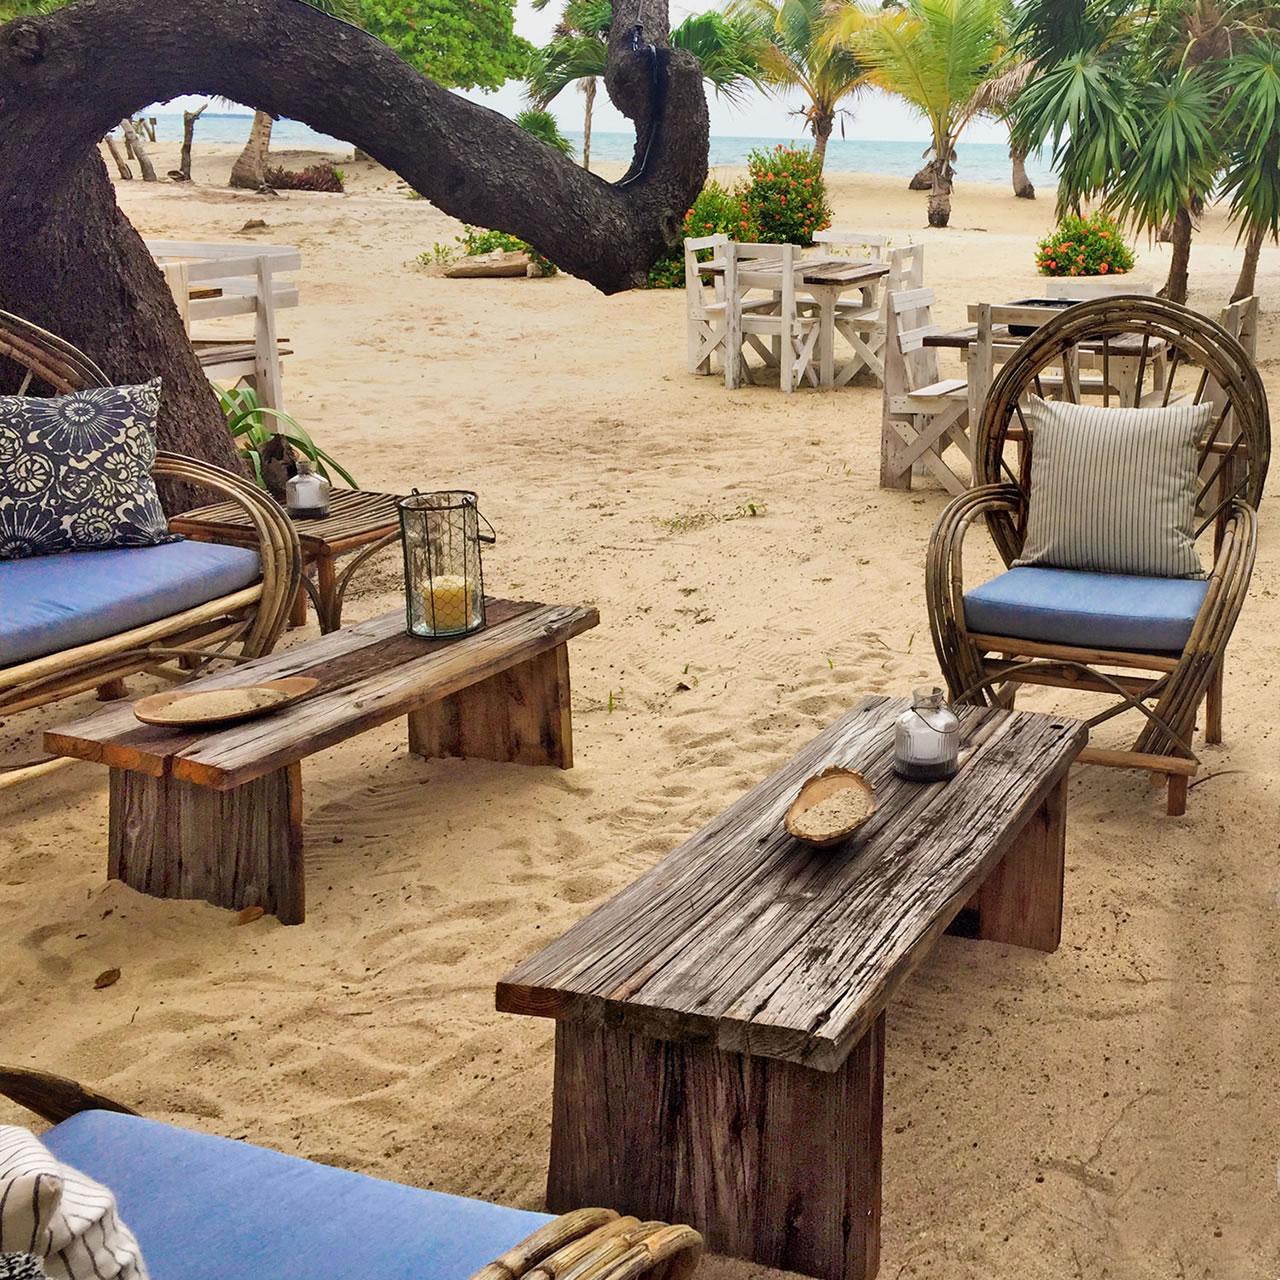 Itz-ana-Resort-and-Residences-Belize (6)